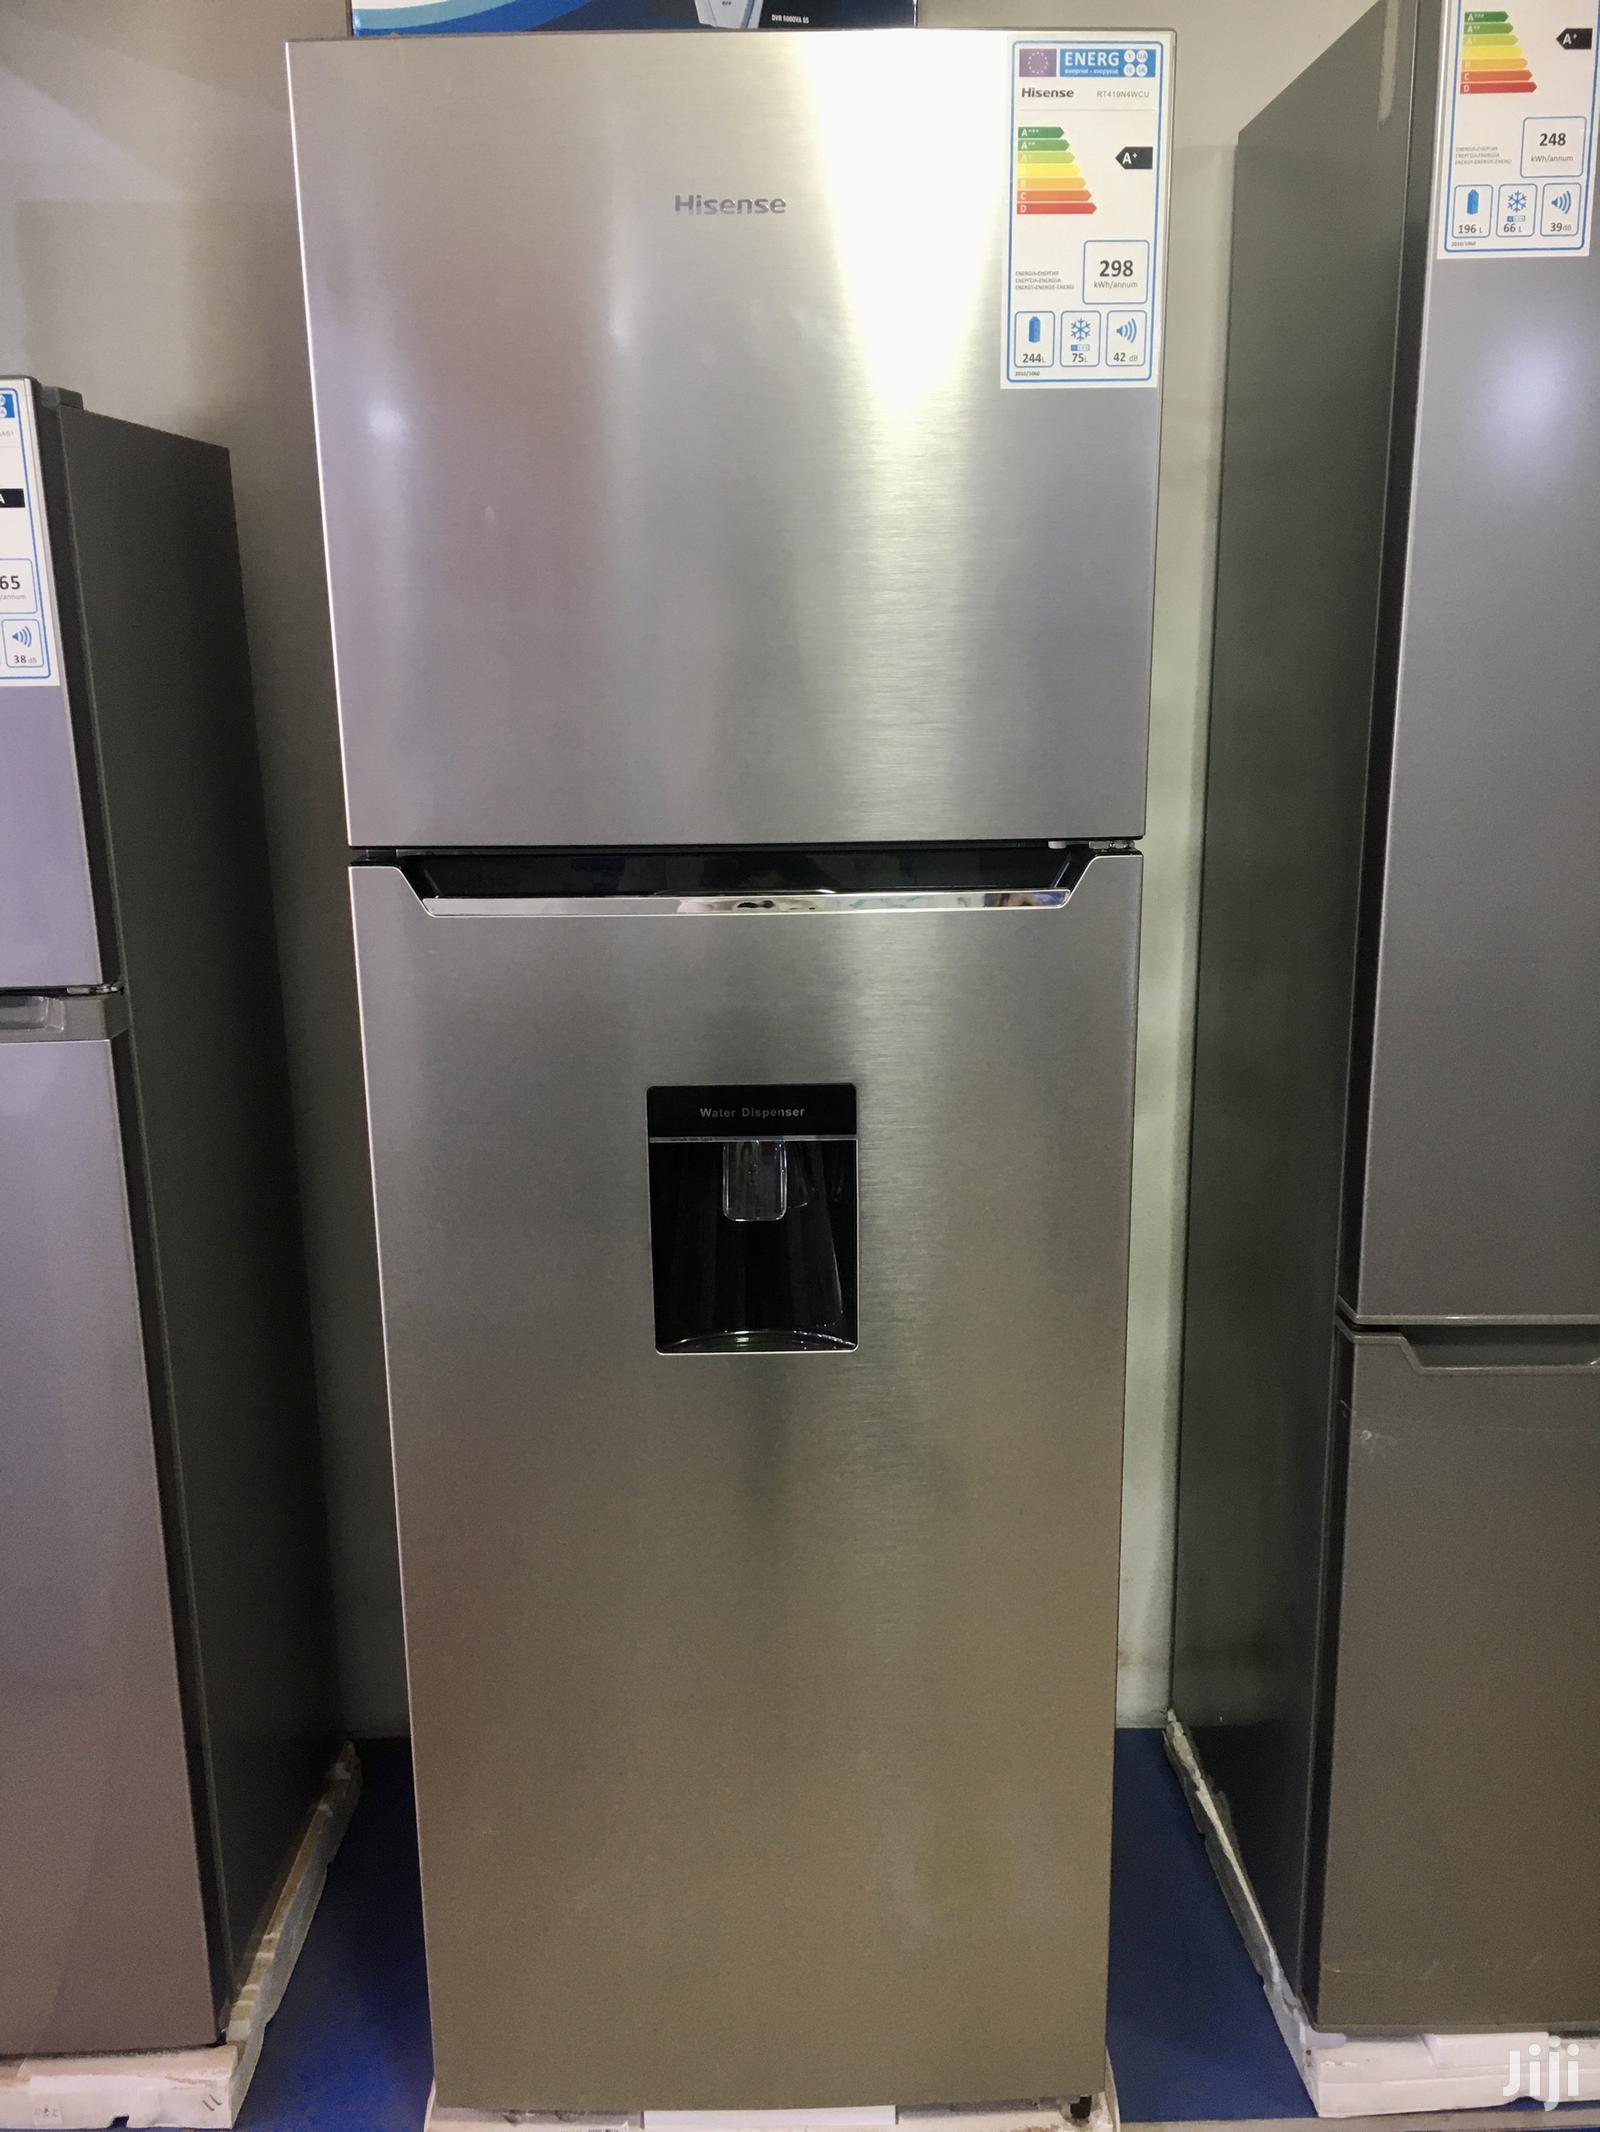 Hisense 419 Litres Refridgerator Frost Free With Dispenser